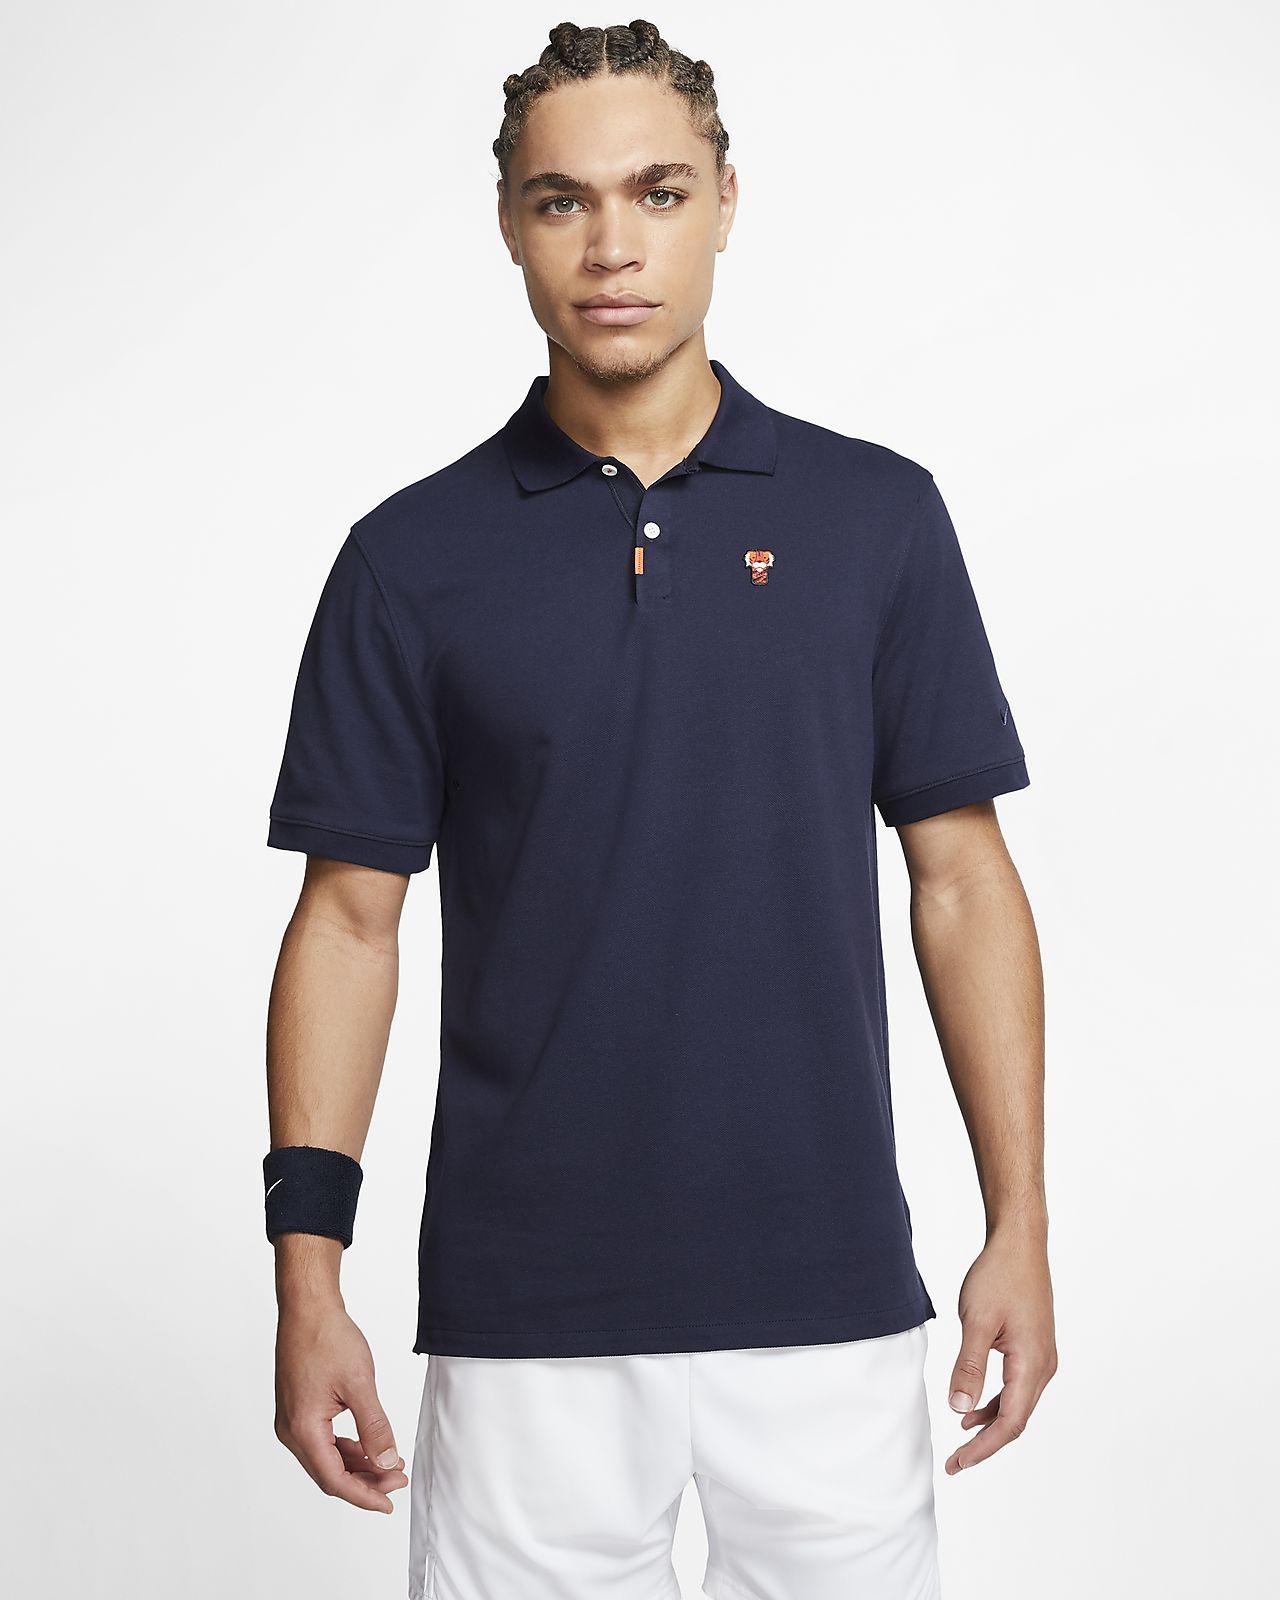 The Nike Polo 'Frank' Slim Fit Polo